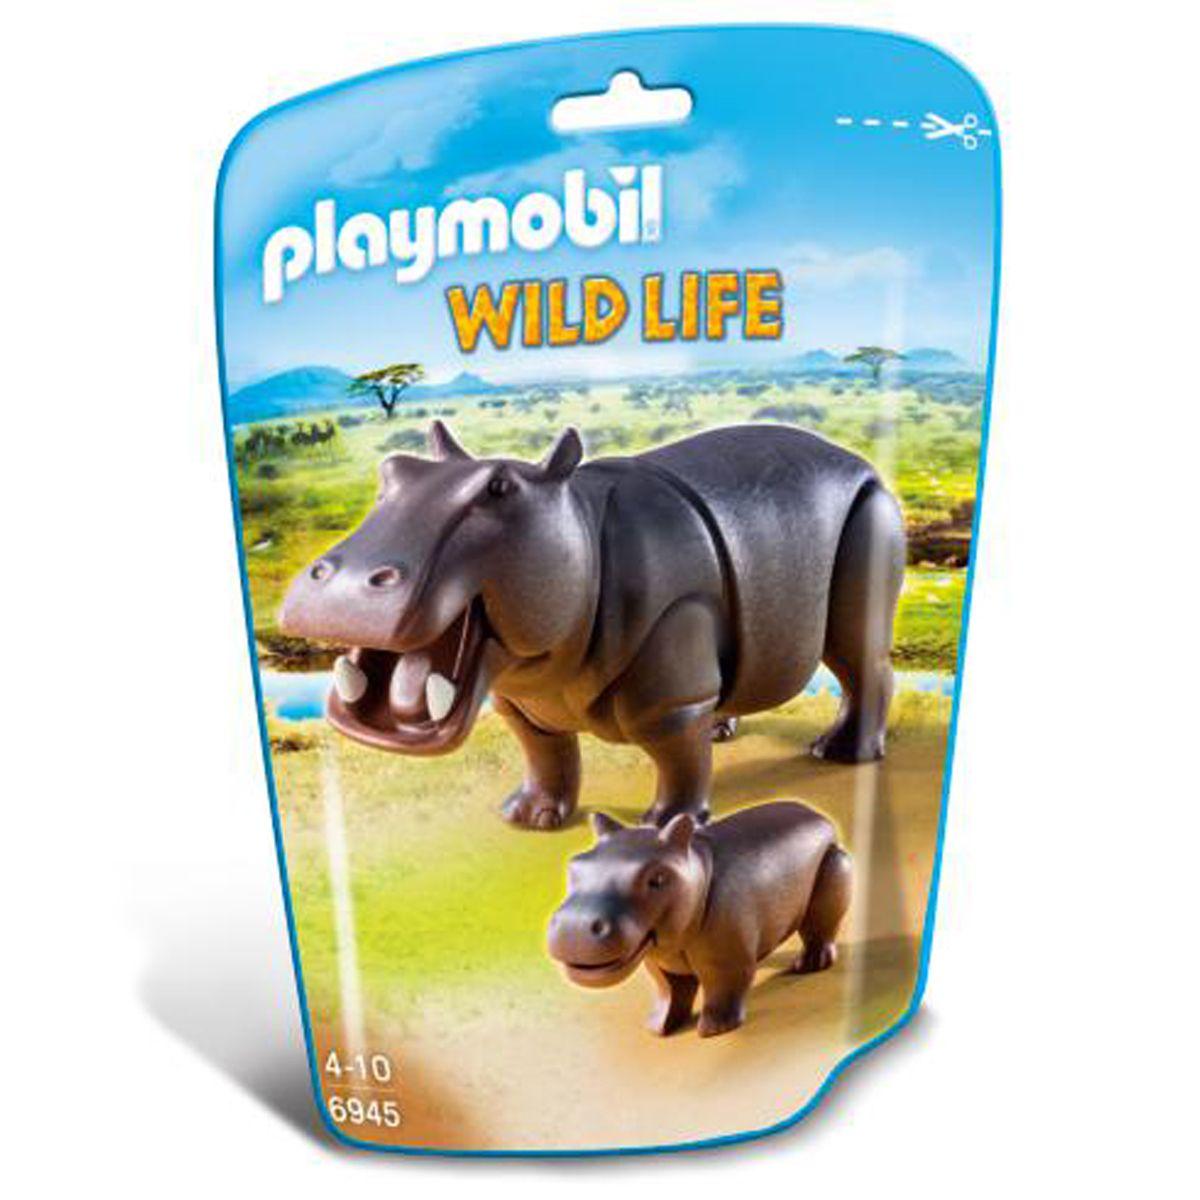 Petit Véhicules 6945 Et Life Wild Hippopotame Playmobil Son 5Tl3uFK1cJ